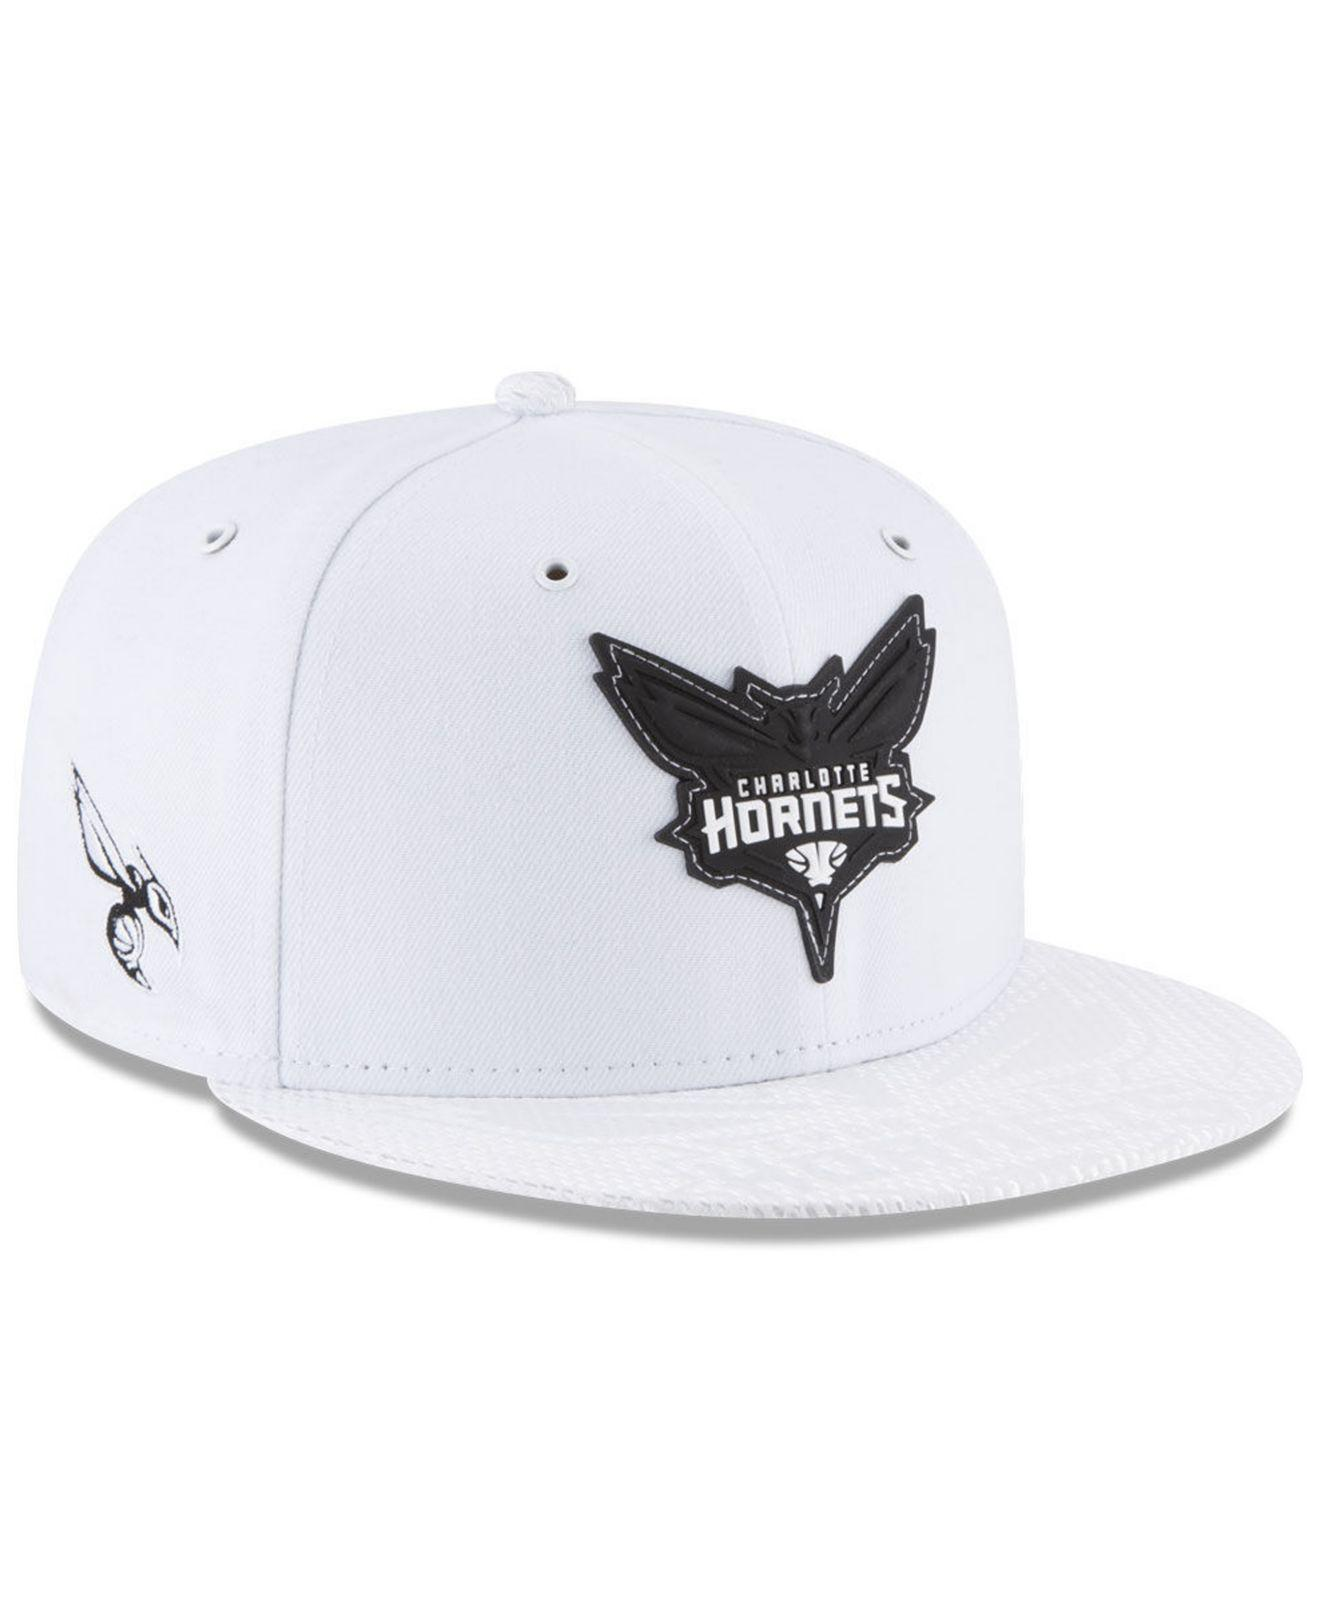 purchase cheap 38e91 1ef6e KTZ - White Charlotte Hornets Back 1 2 Series 9fifty Snapback Cap for Men  -. View fullscreen